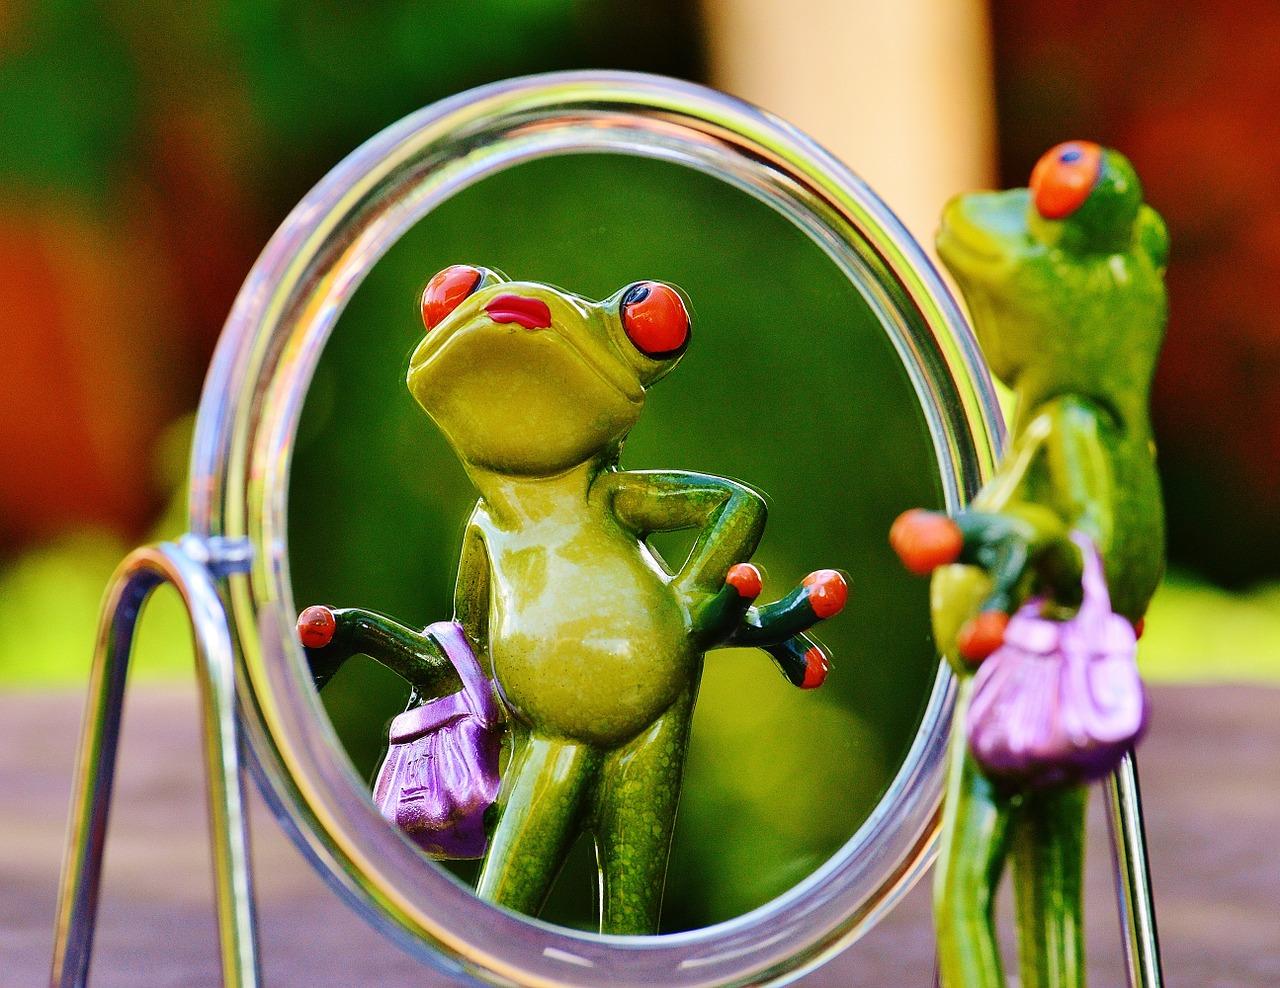 frog-1499068_1280.jpg